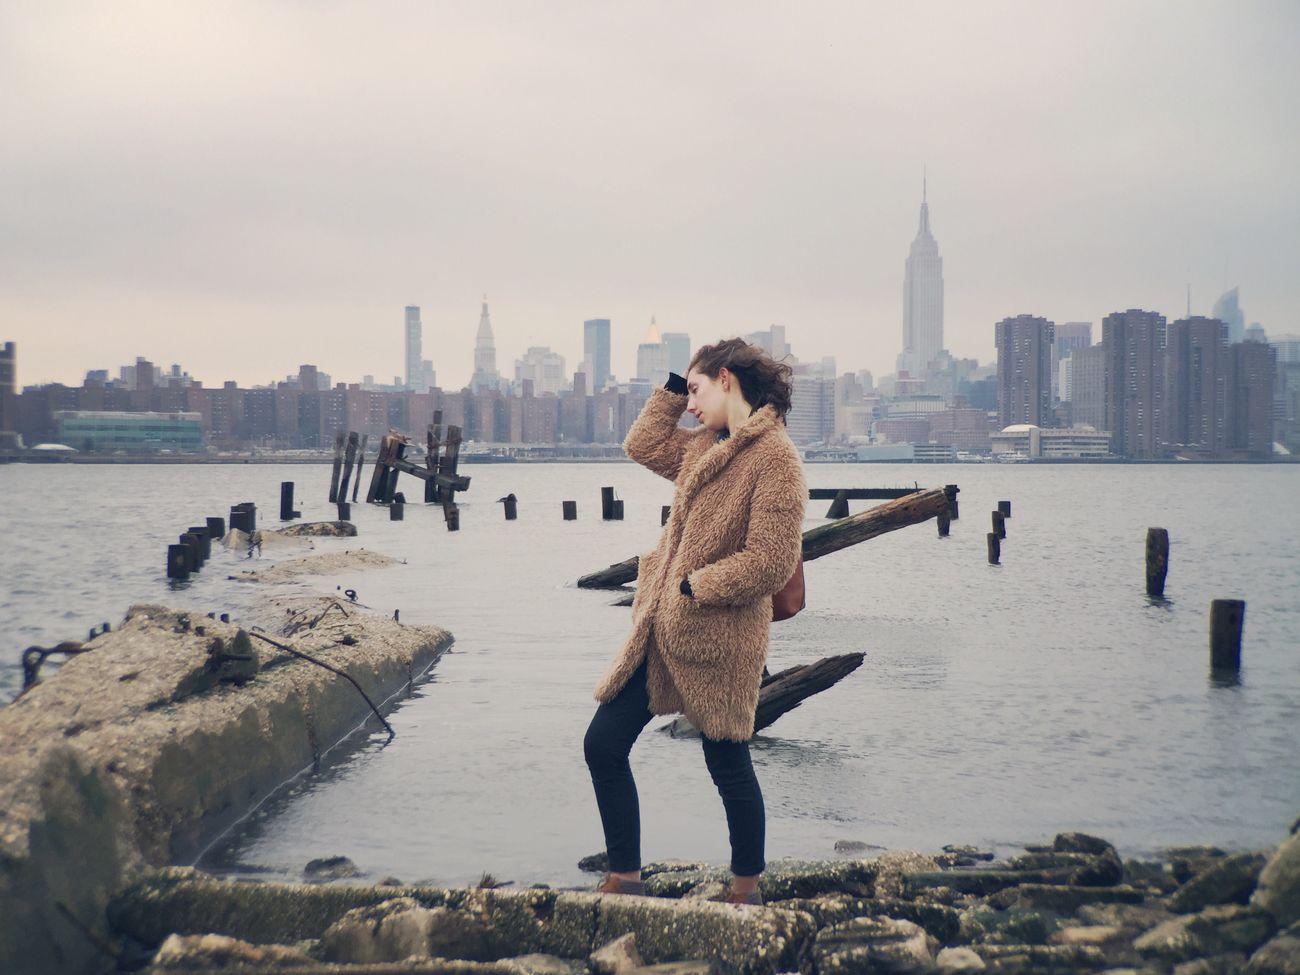 New York City Bushwickinletpark East River, NYC Girl